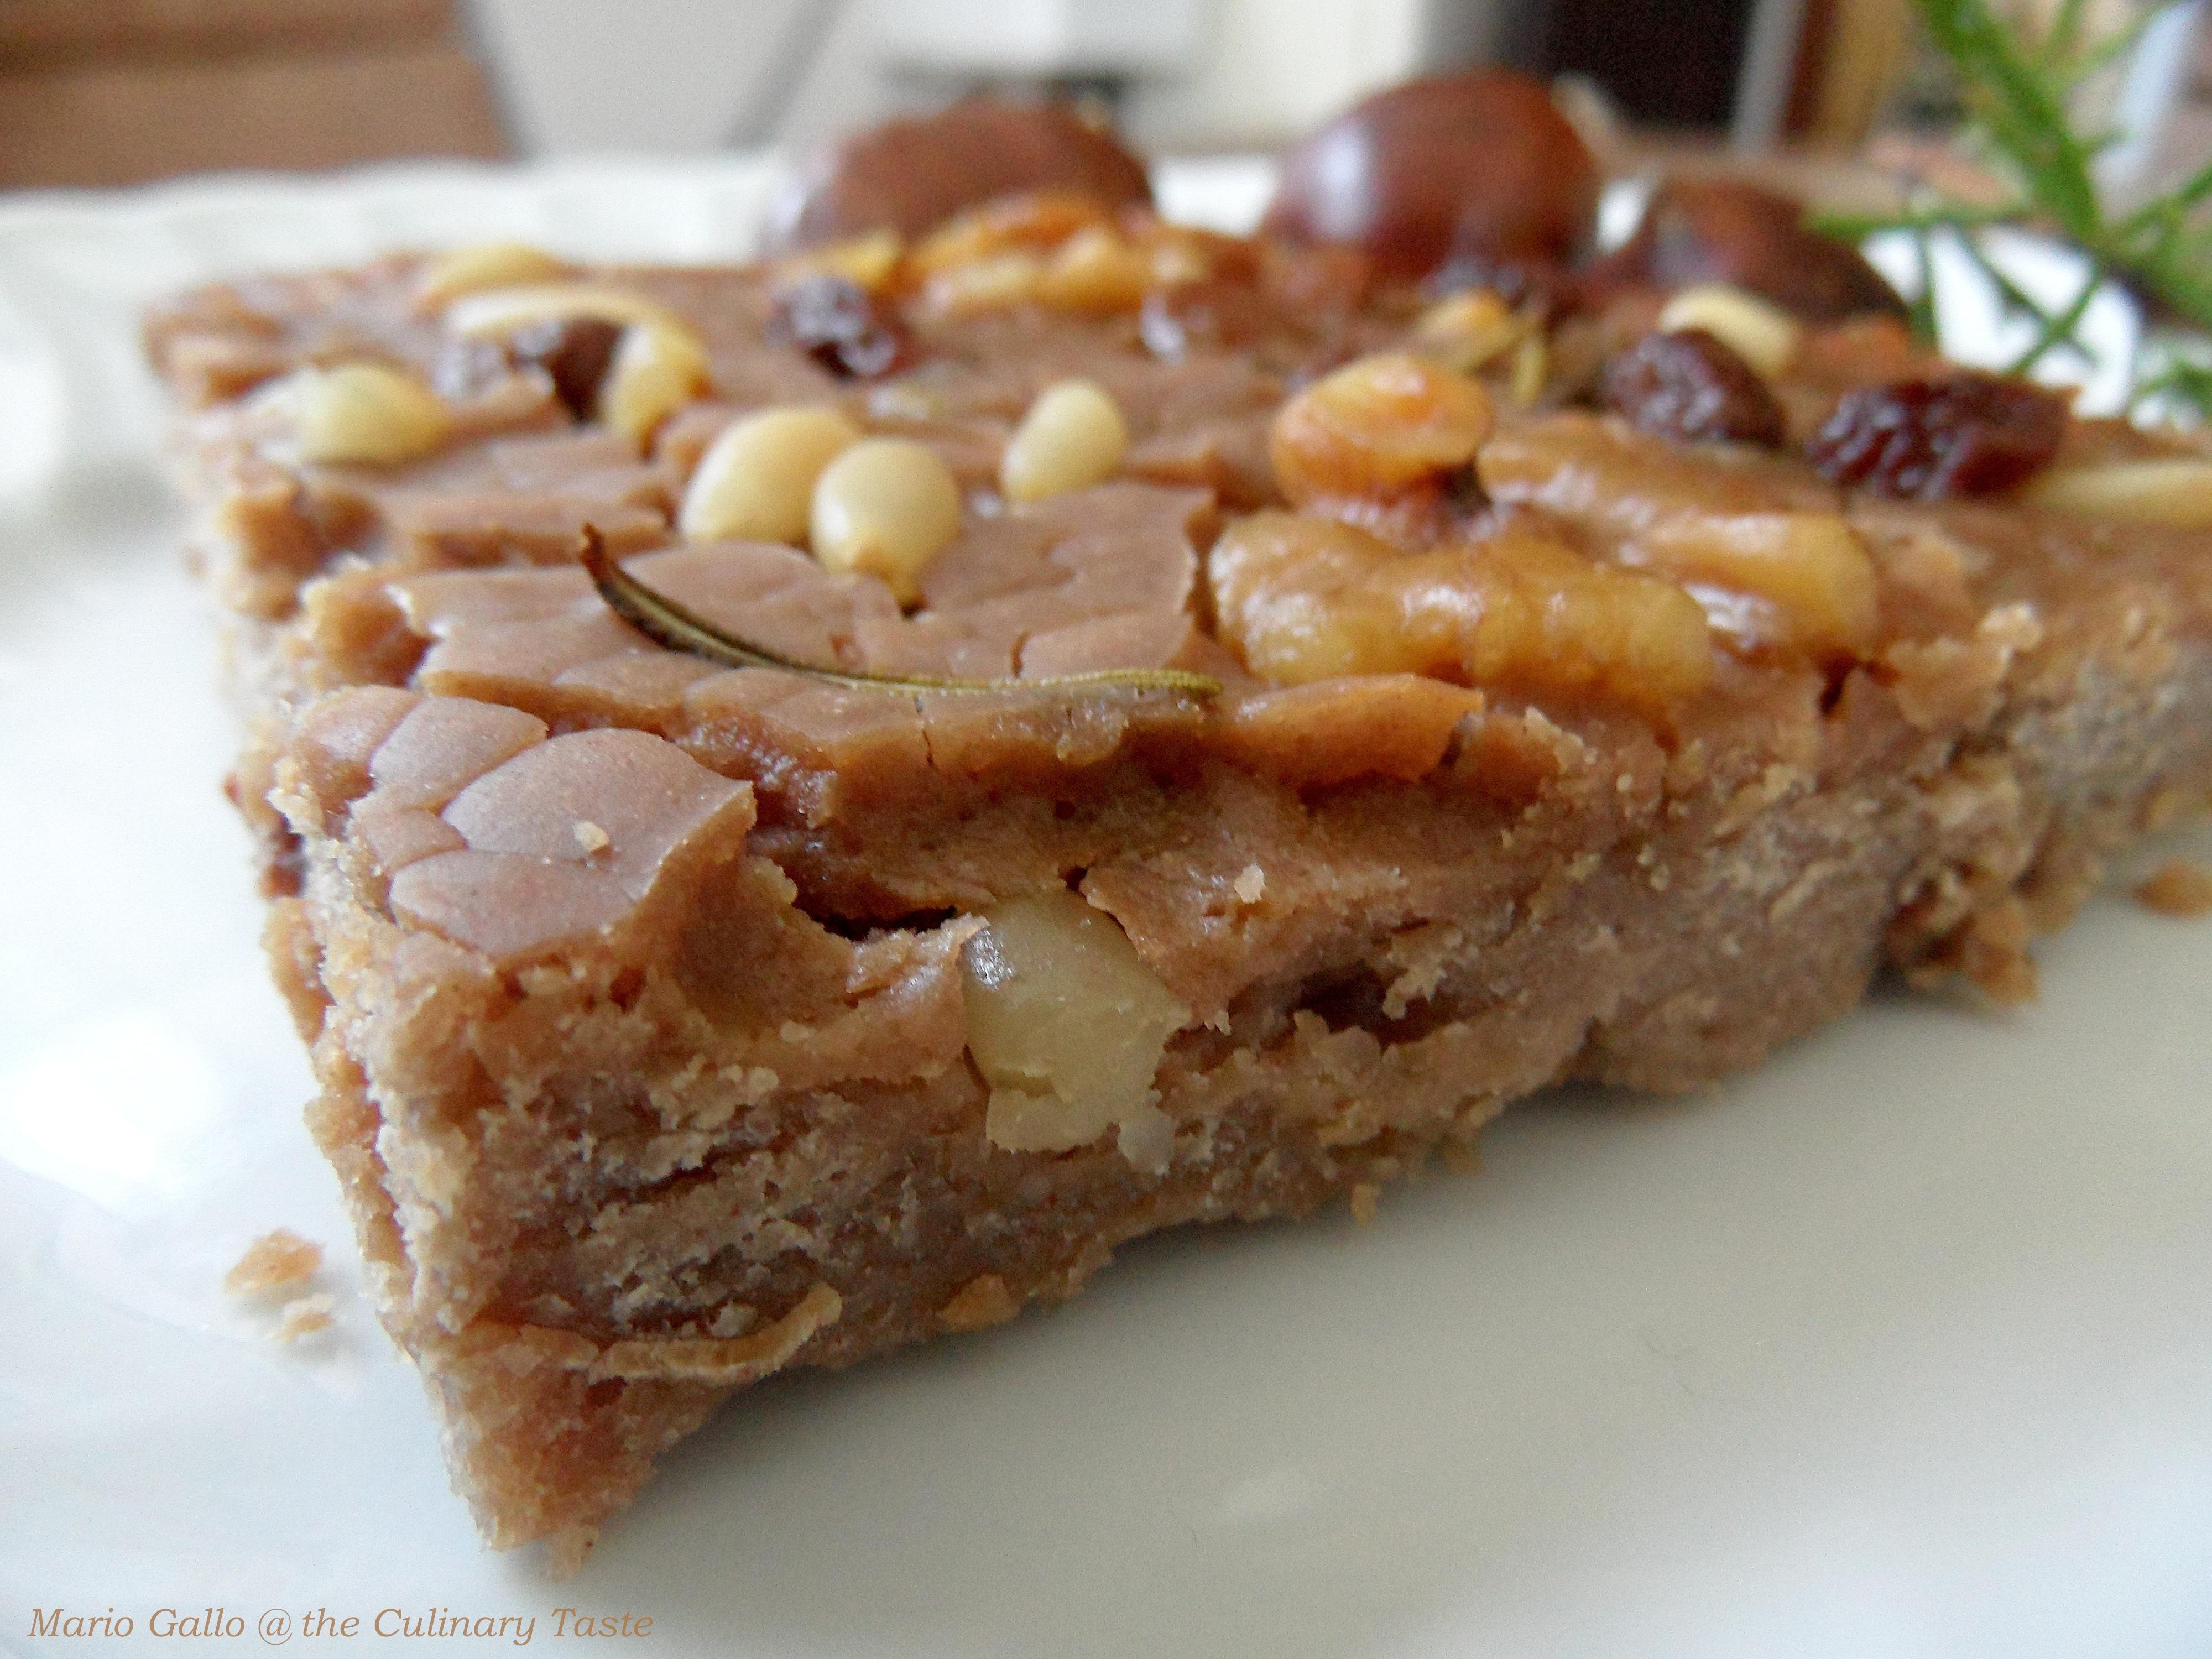 Gluten Free Vegan Vanilla Birthday Cake